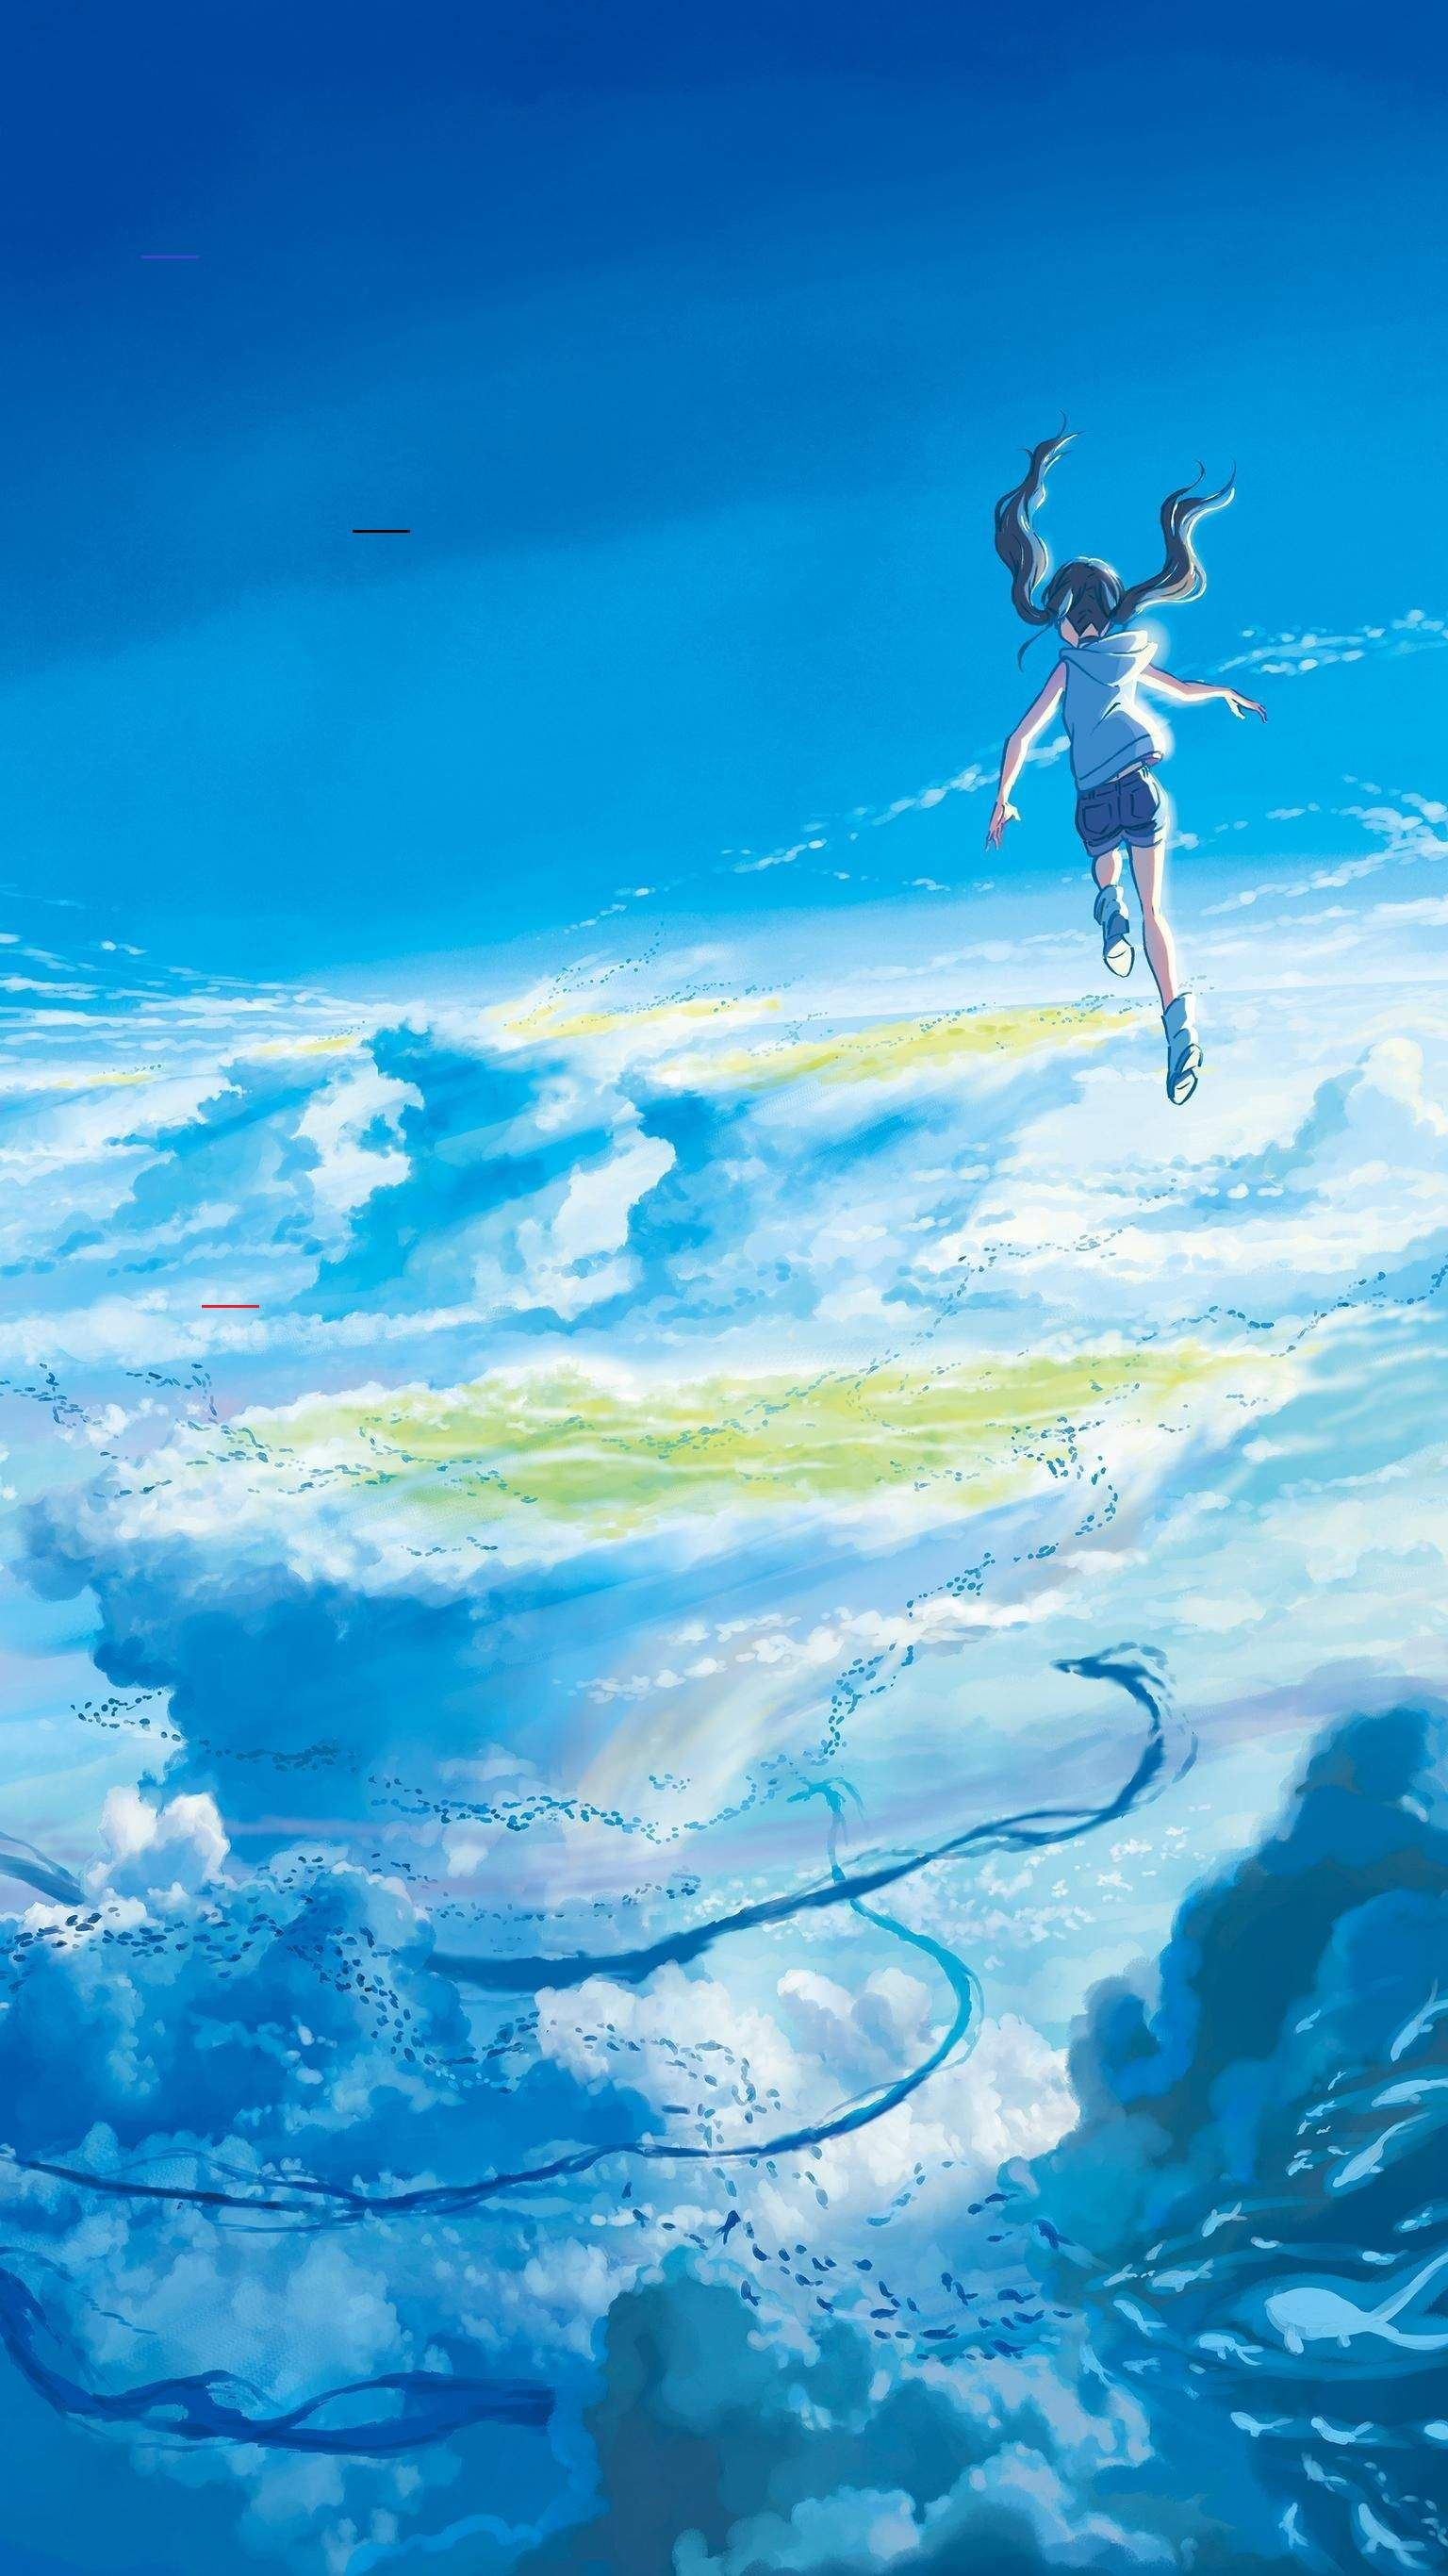 Coldrainydayoutfit Jun 22 2020 A Delightful Removable Wallpaper Perfect For Nurseries Thr En 2020 Paysage Manga Japon Illustration Fond D Ecran Telephone Manga